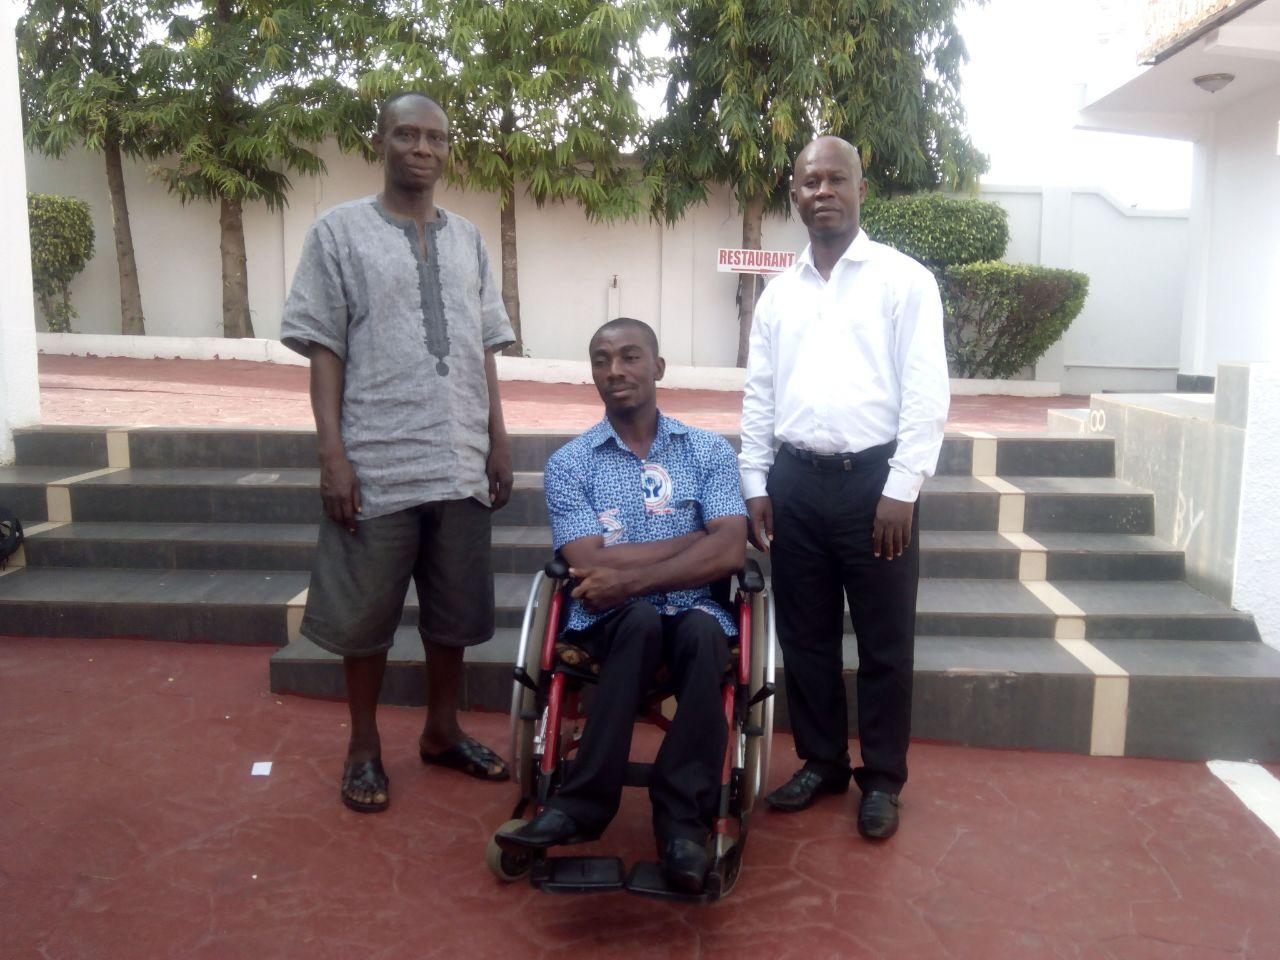 From left to right- Mr Richard Bremfi, Mr John Owusu, Mr Armstrong Adade Yamoah